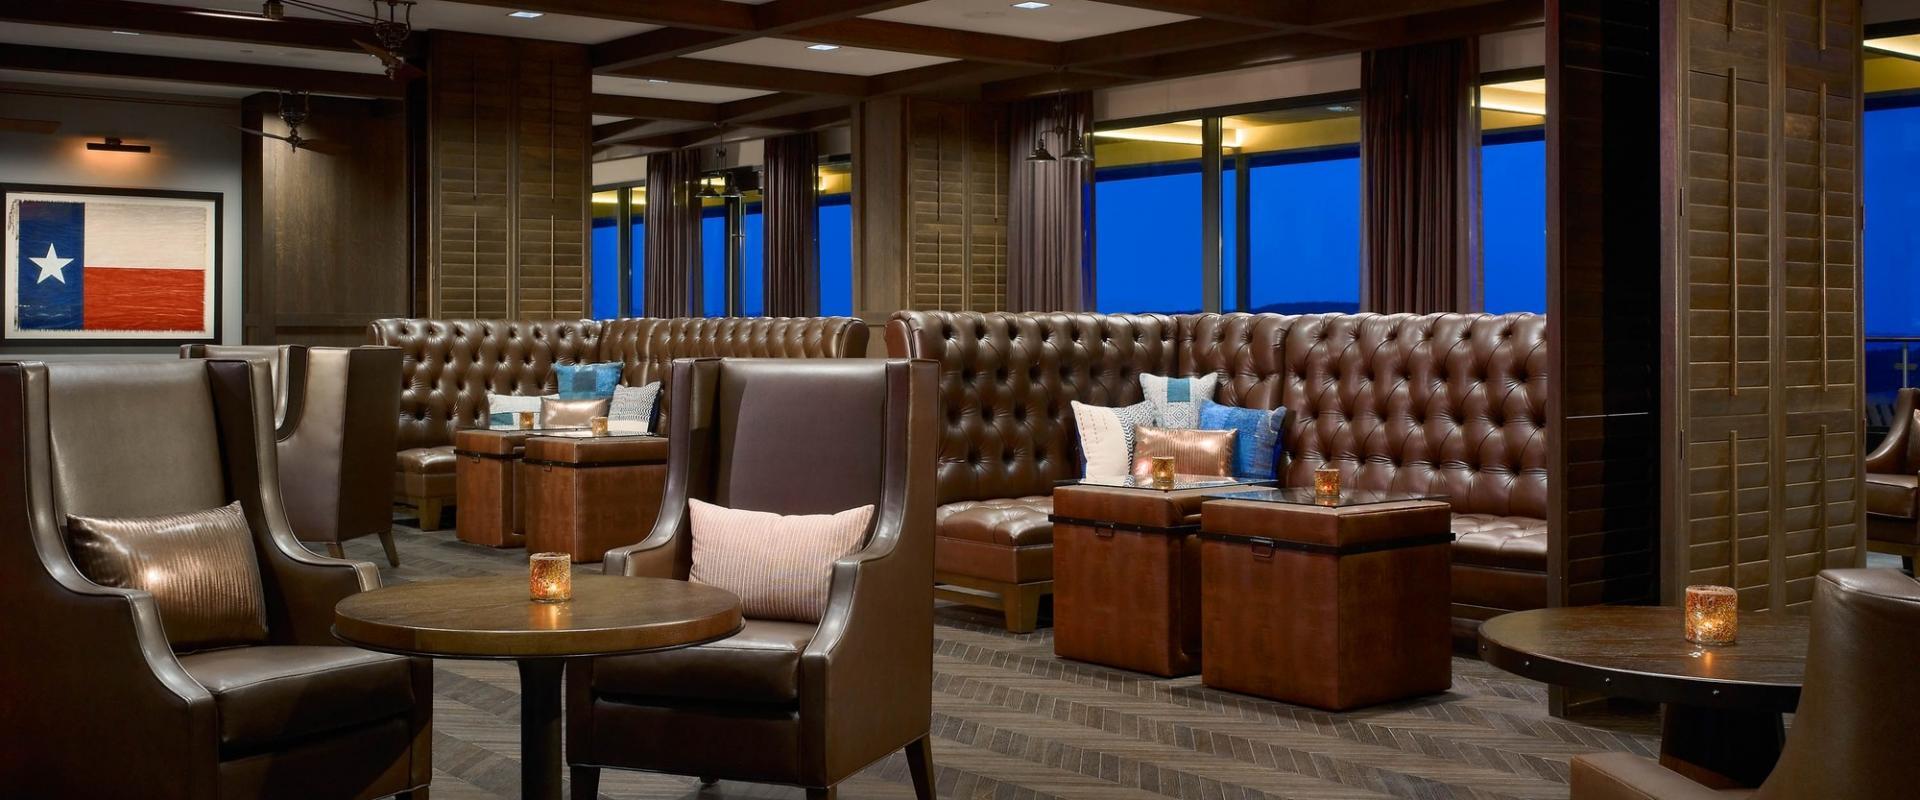 Meridian 98 Lounge at Sonesta Hotel